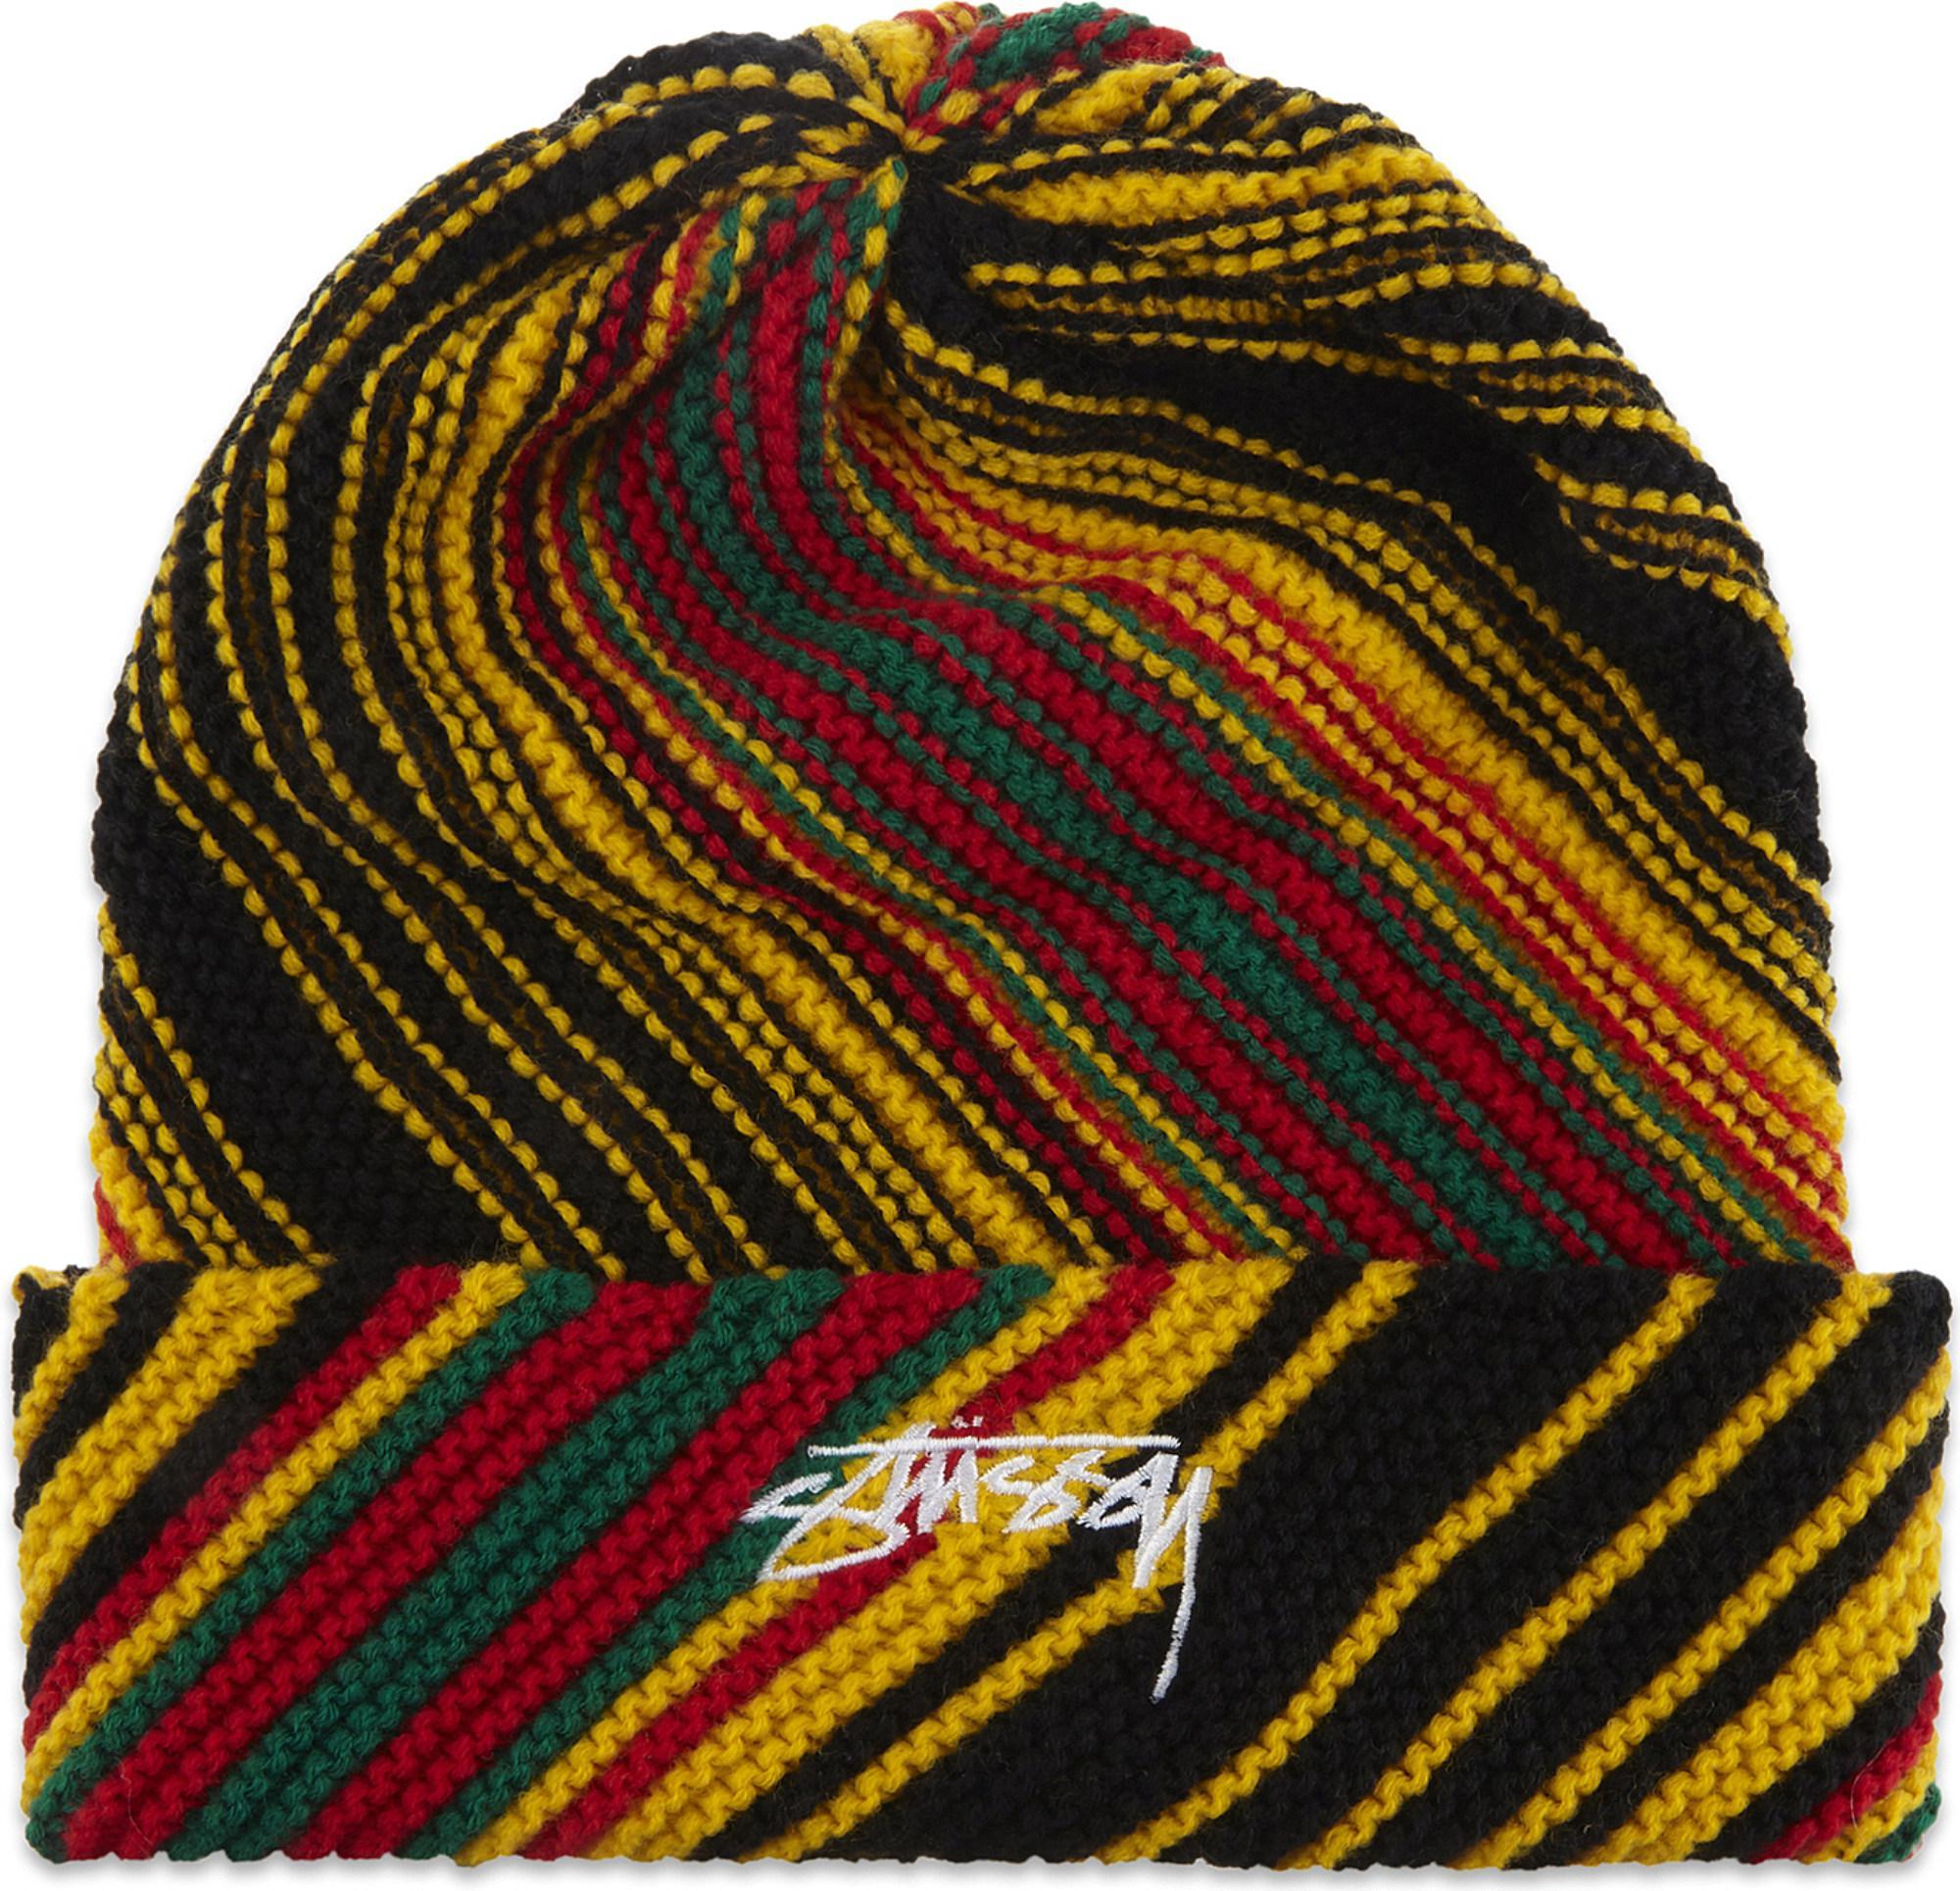 9b0de33e5b4 Lyst - Stussy Tribe Striped Cuff Beanie Hat for Men